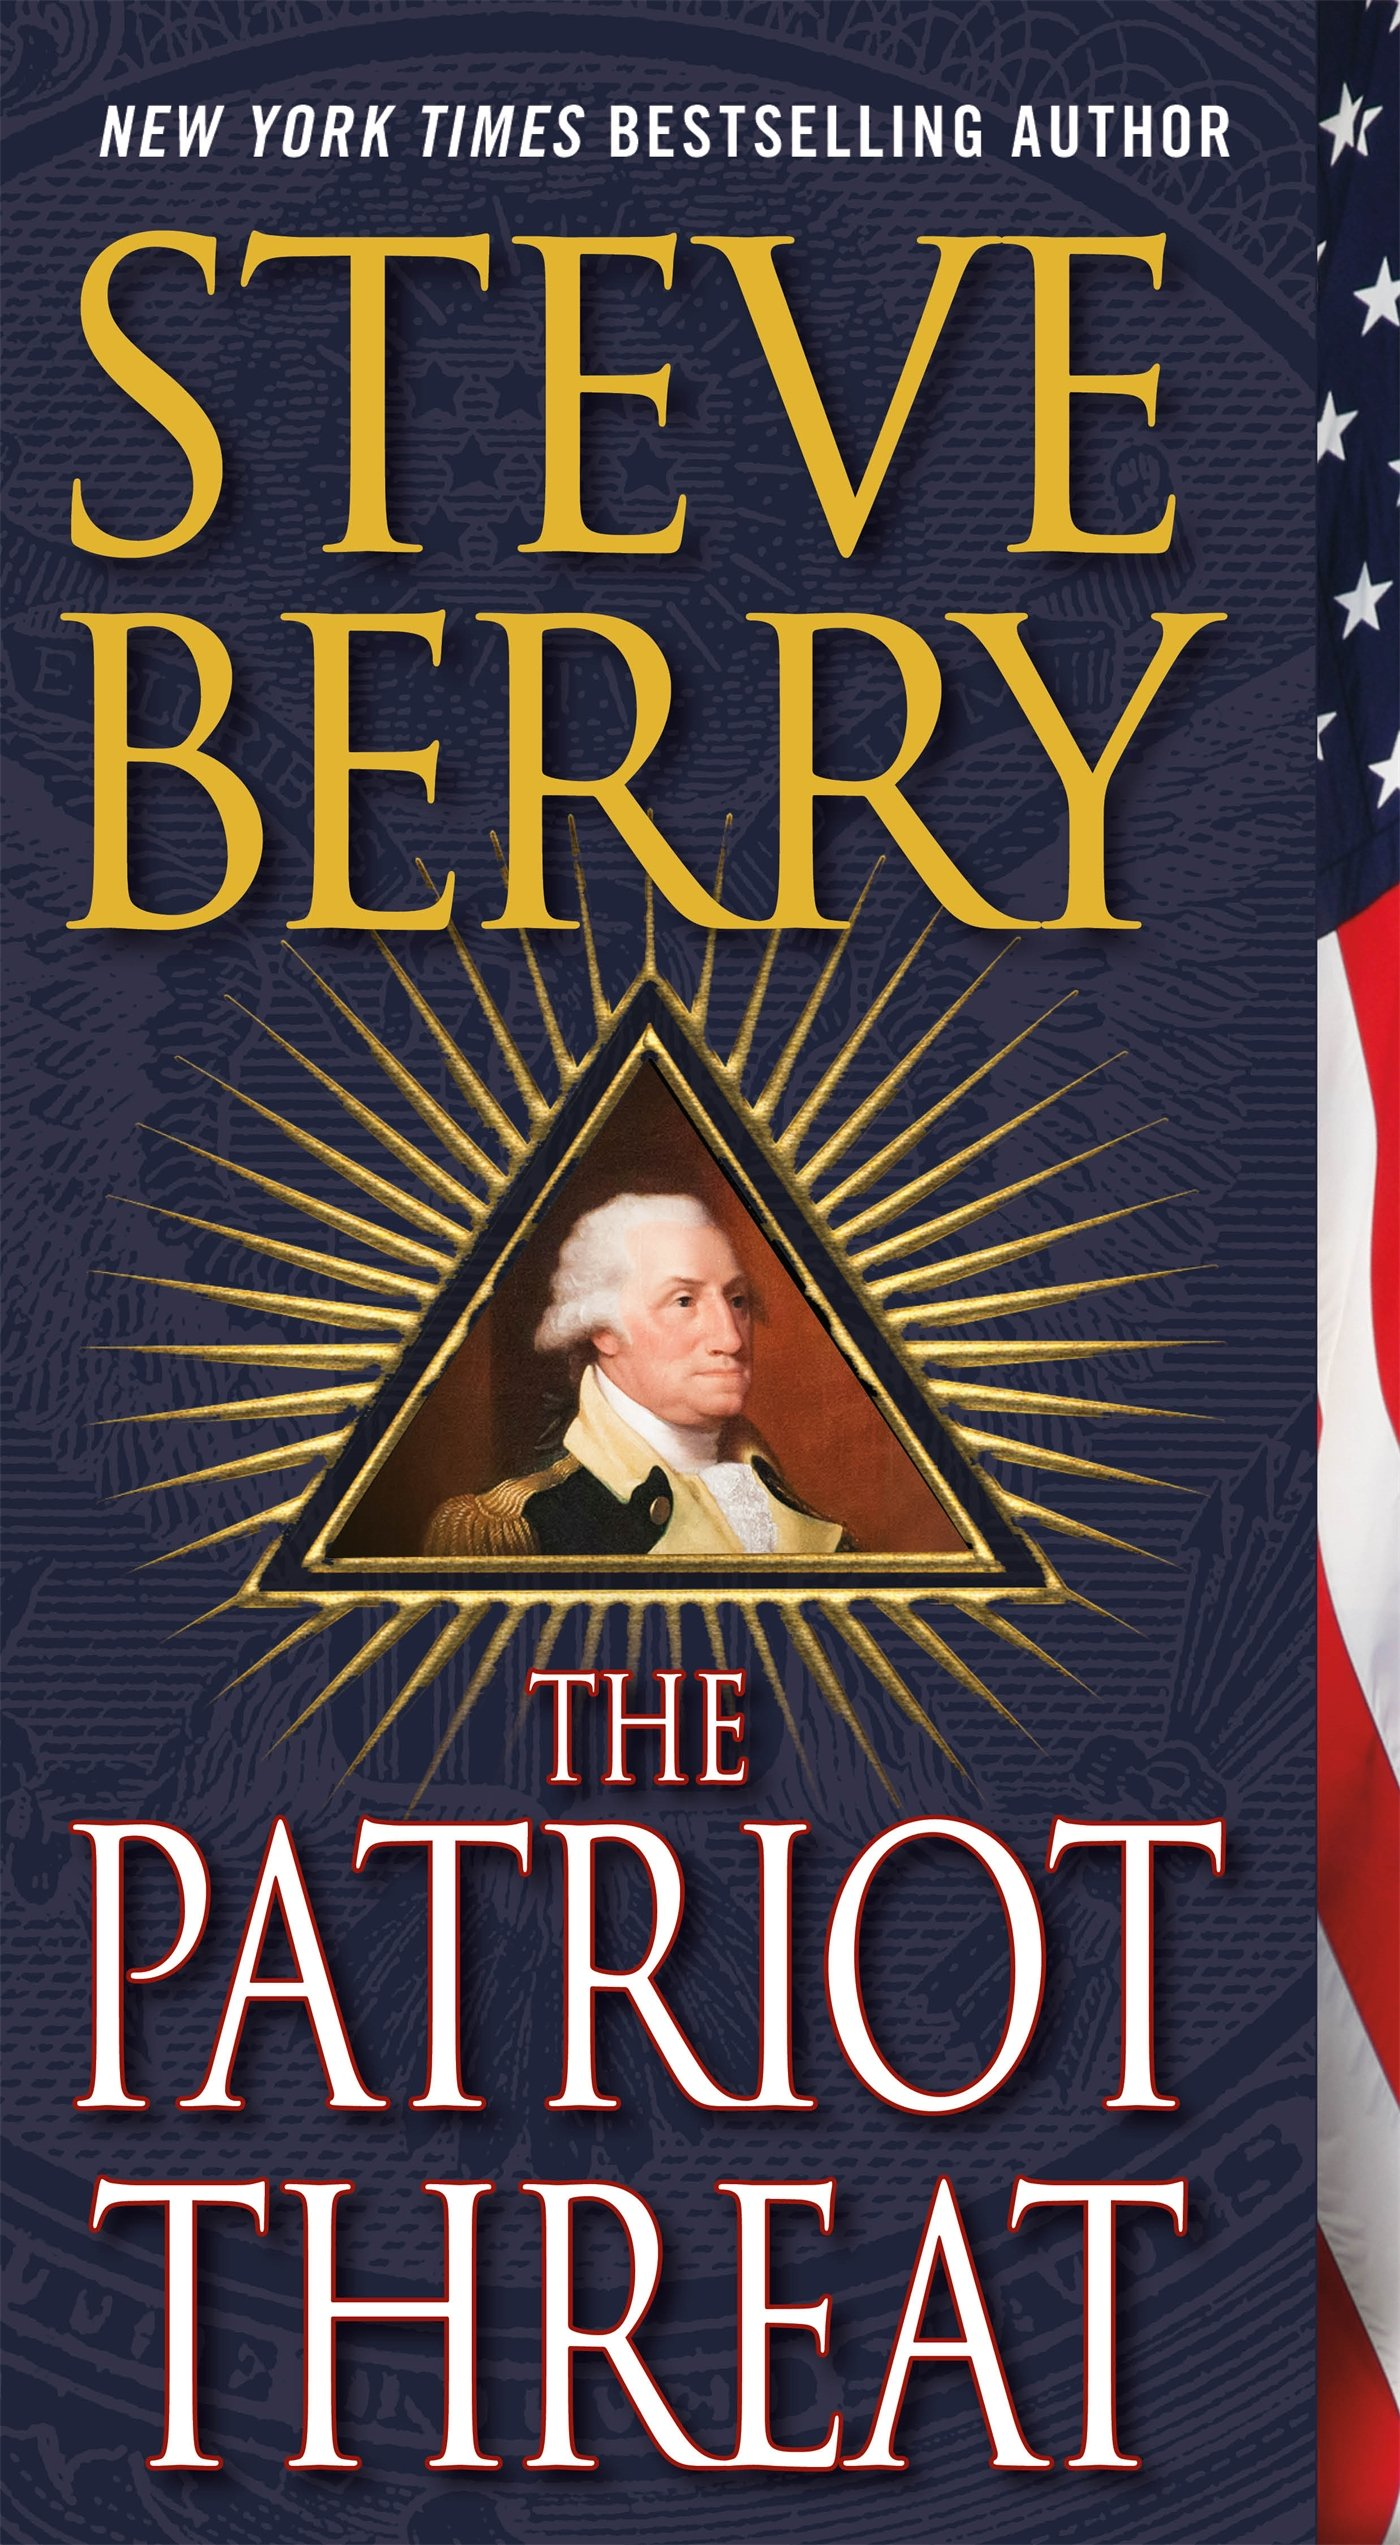 Amazon.com: The Patriot Threat: A Novel (Cotton Malone) (9781250058447): Steve  Berry: Books